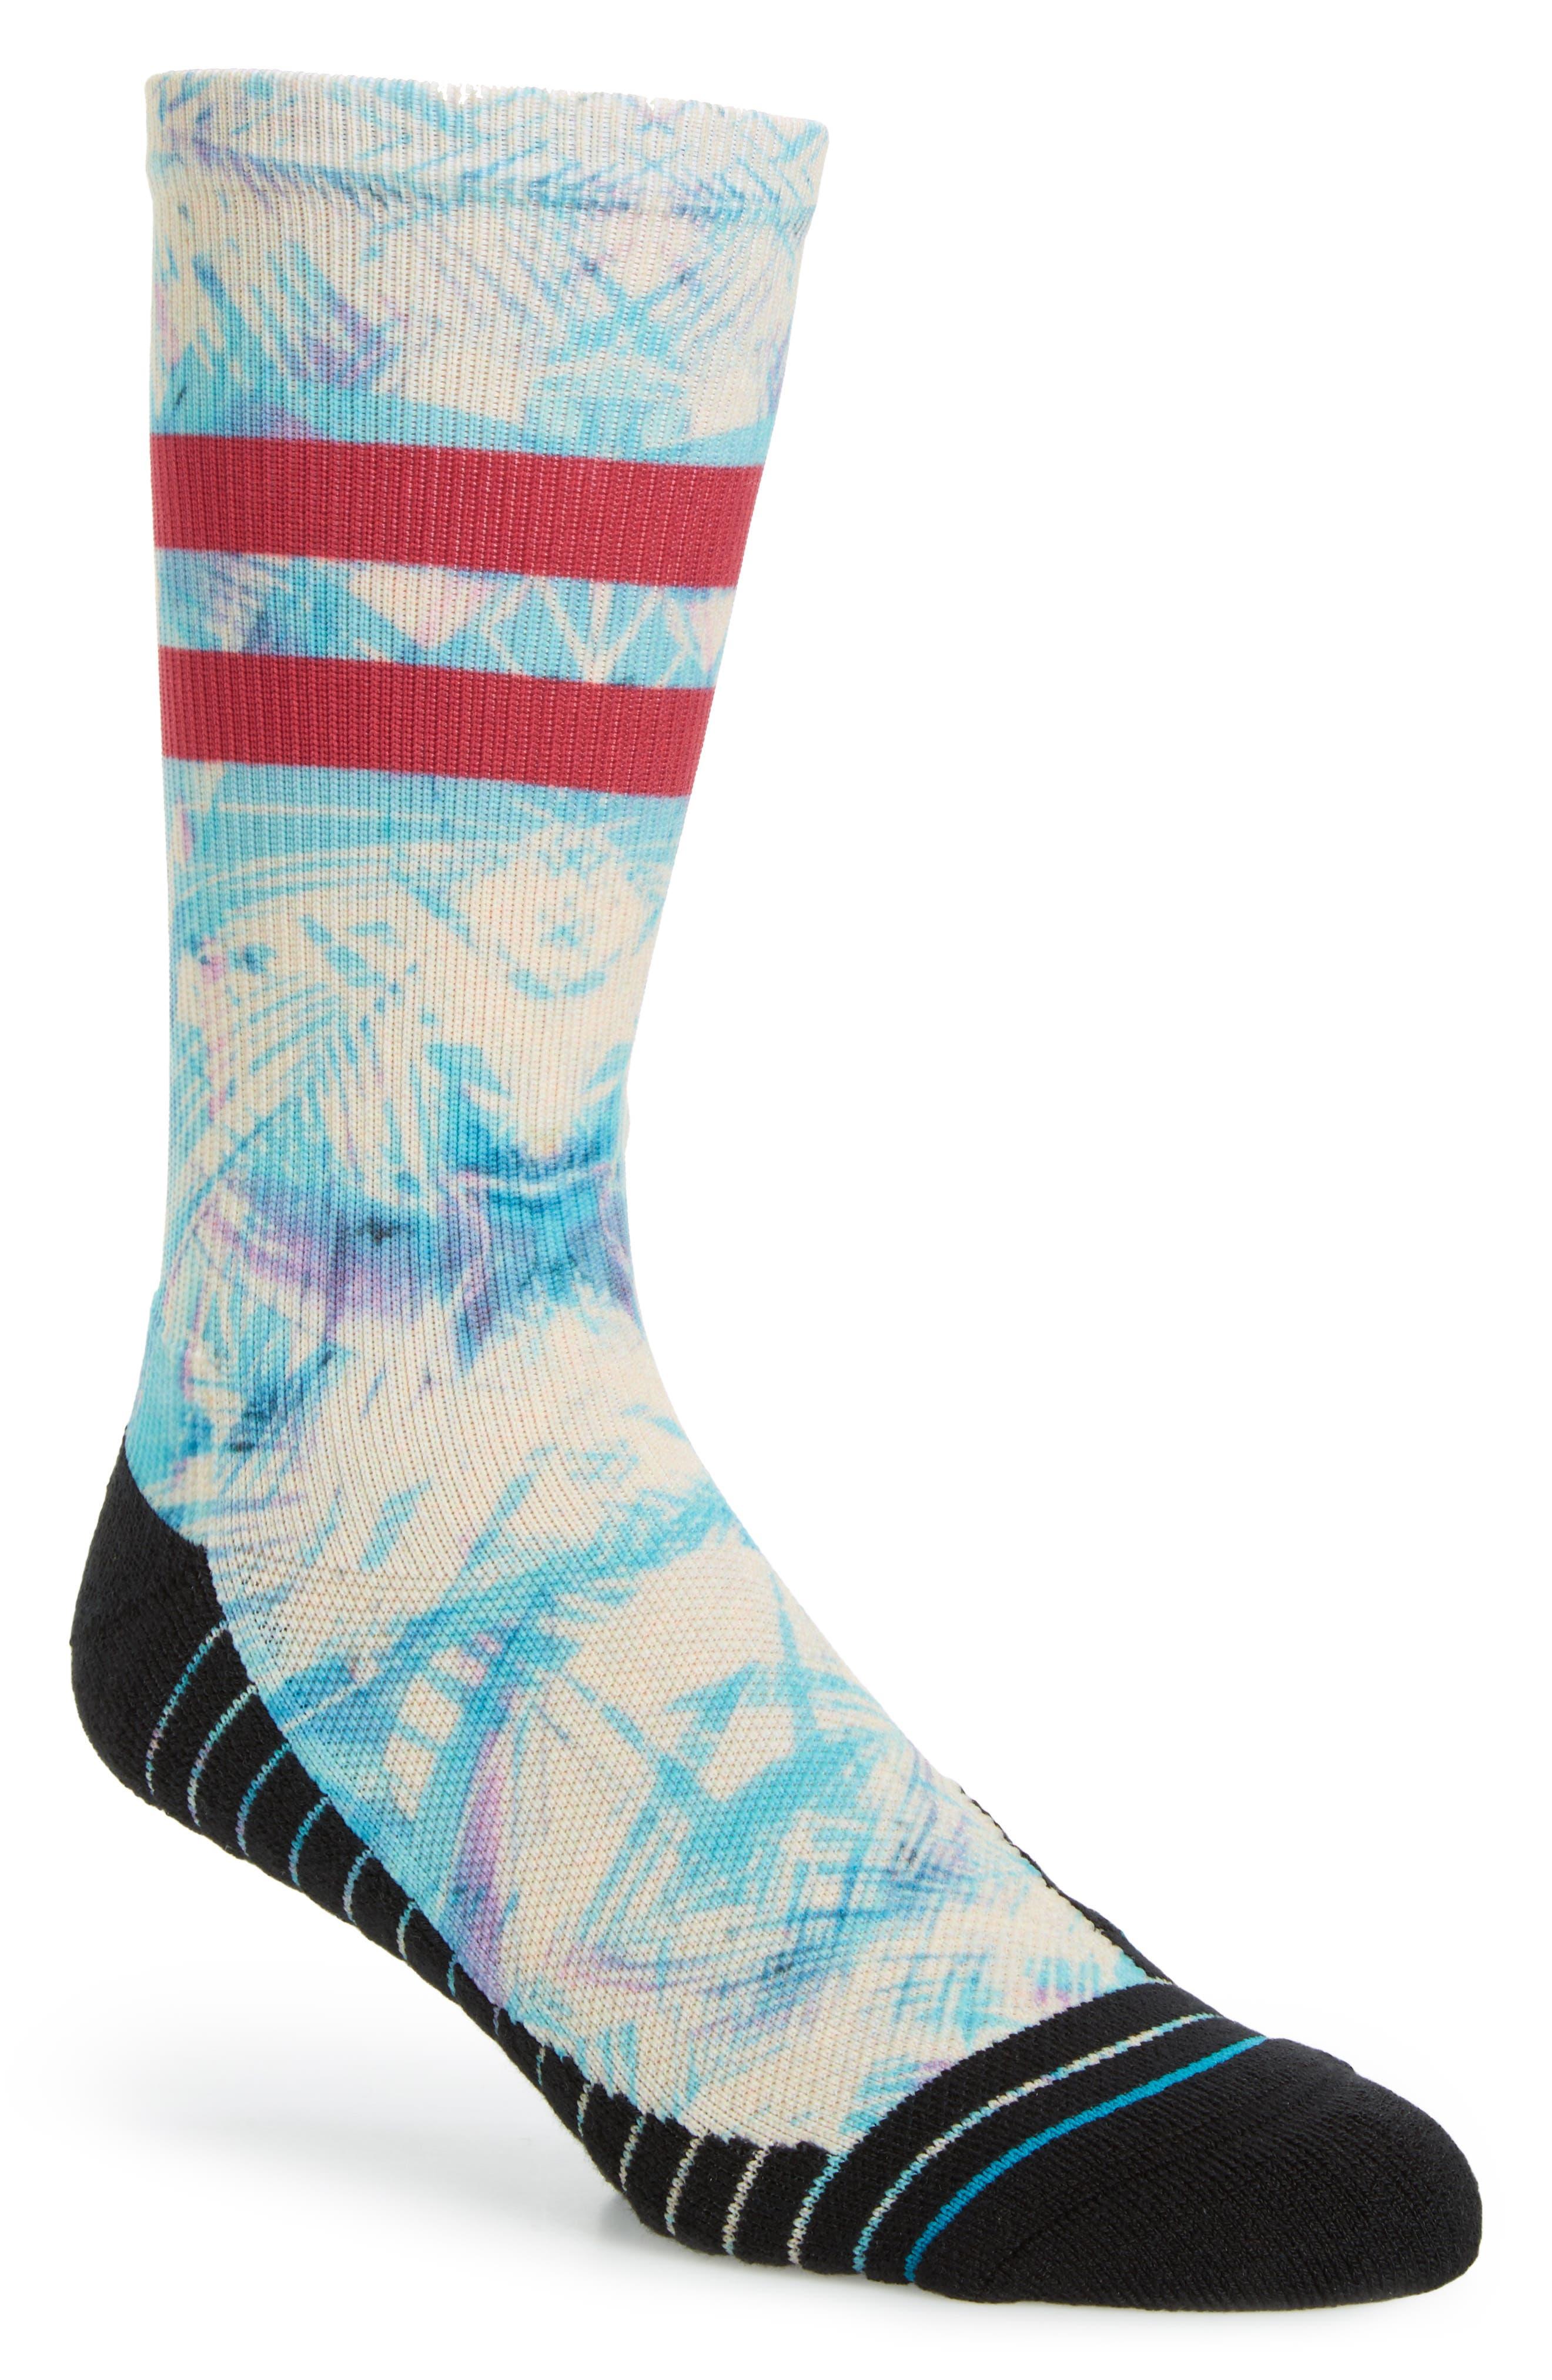 Stance Ultraviolet Atheltic Crew Socks